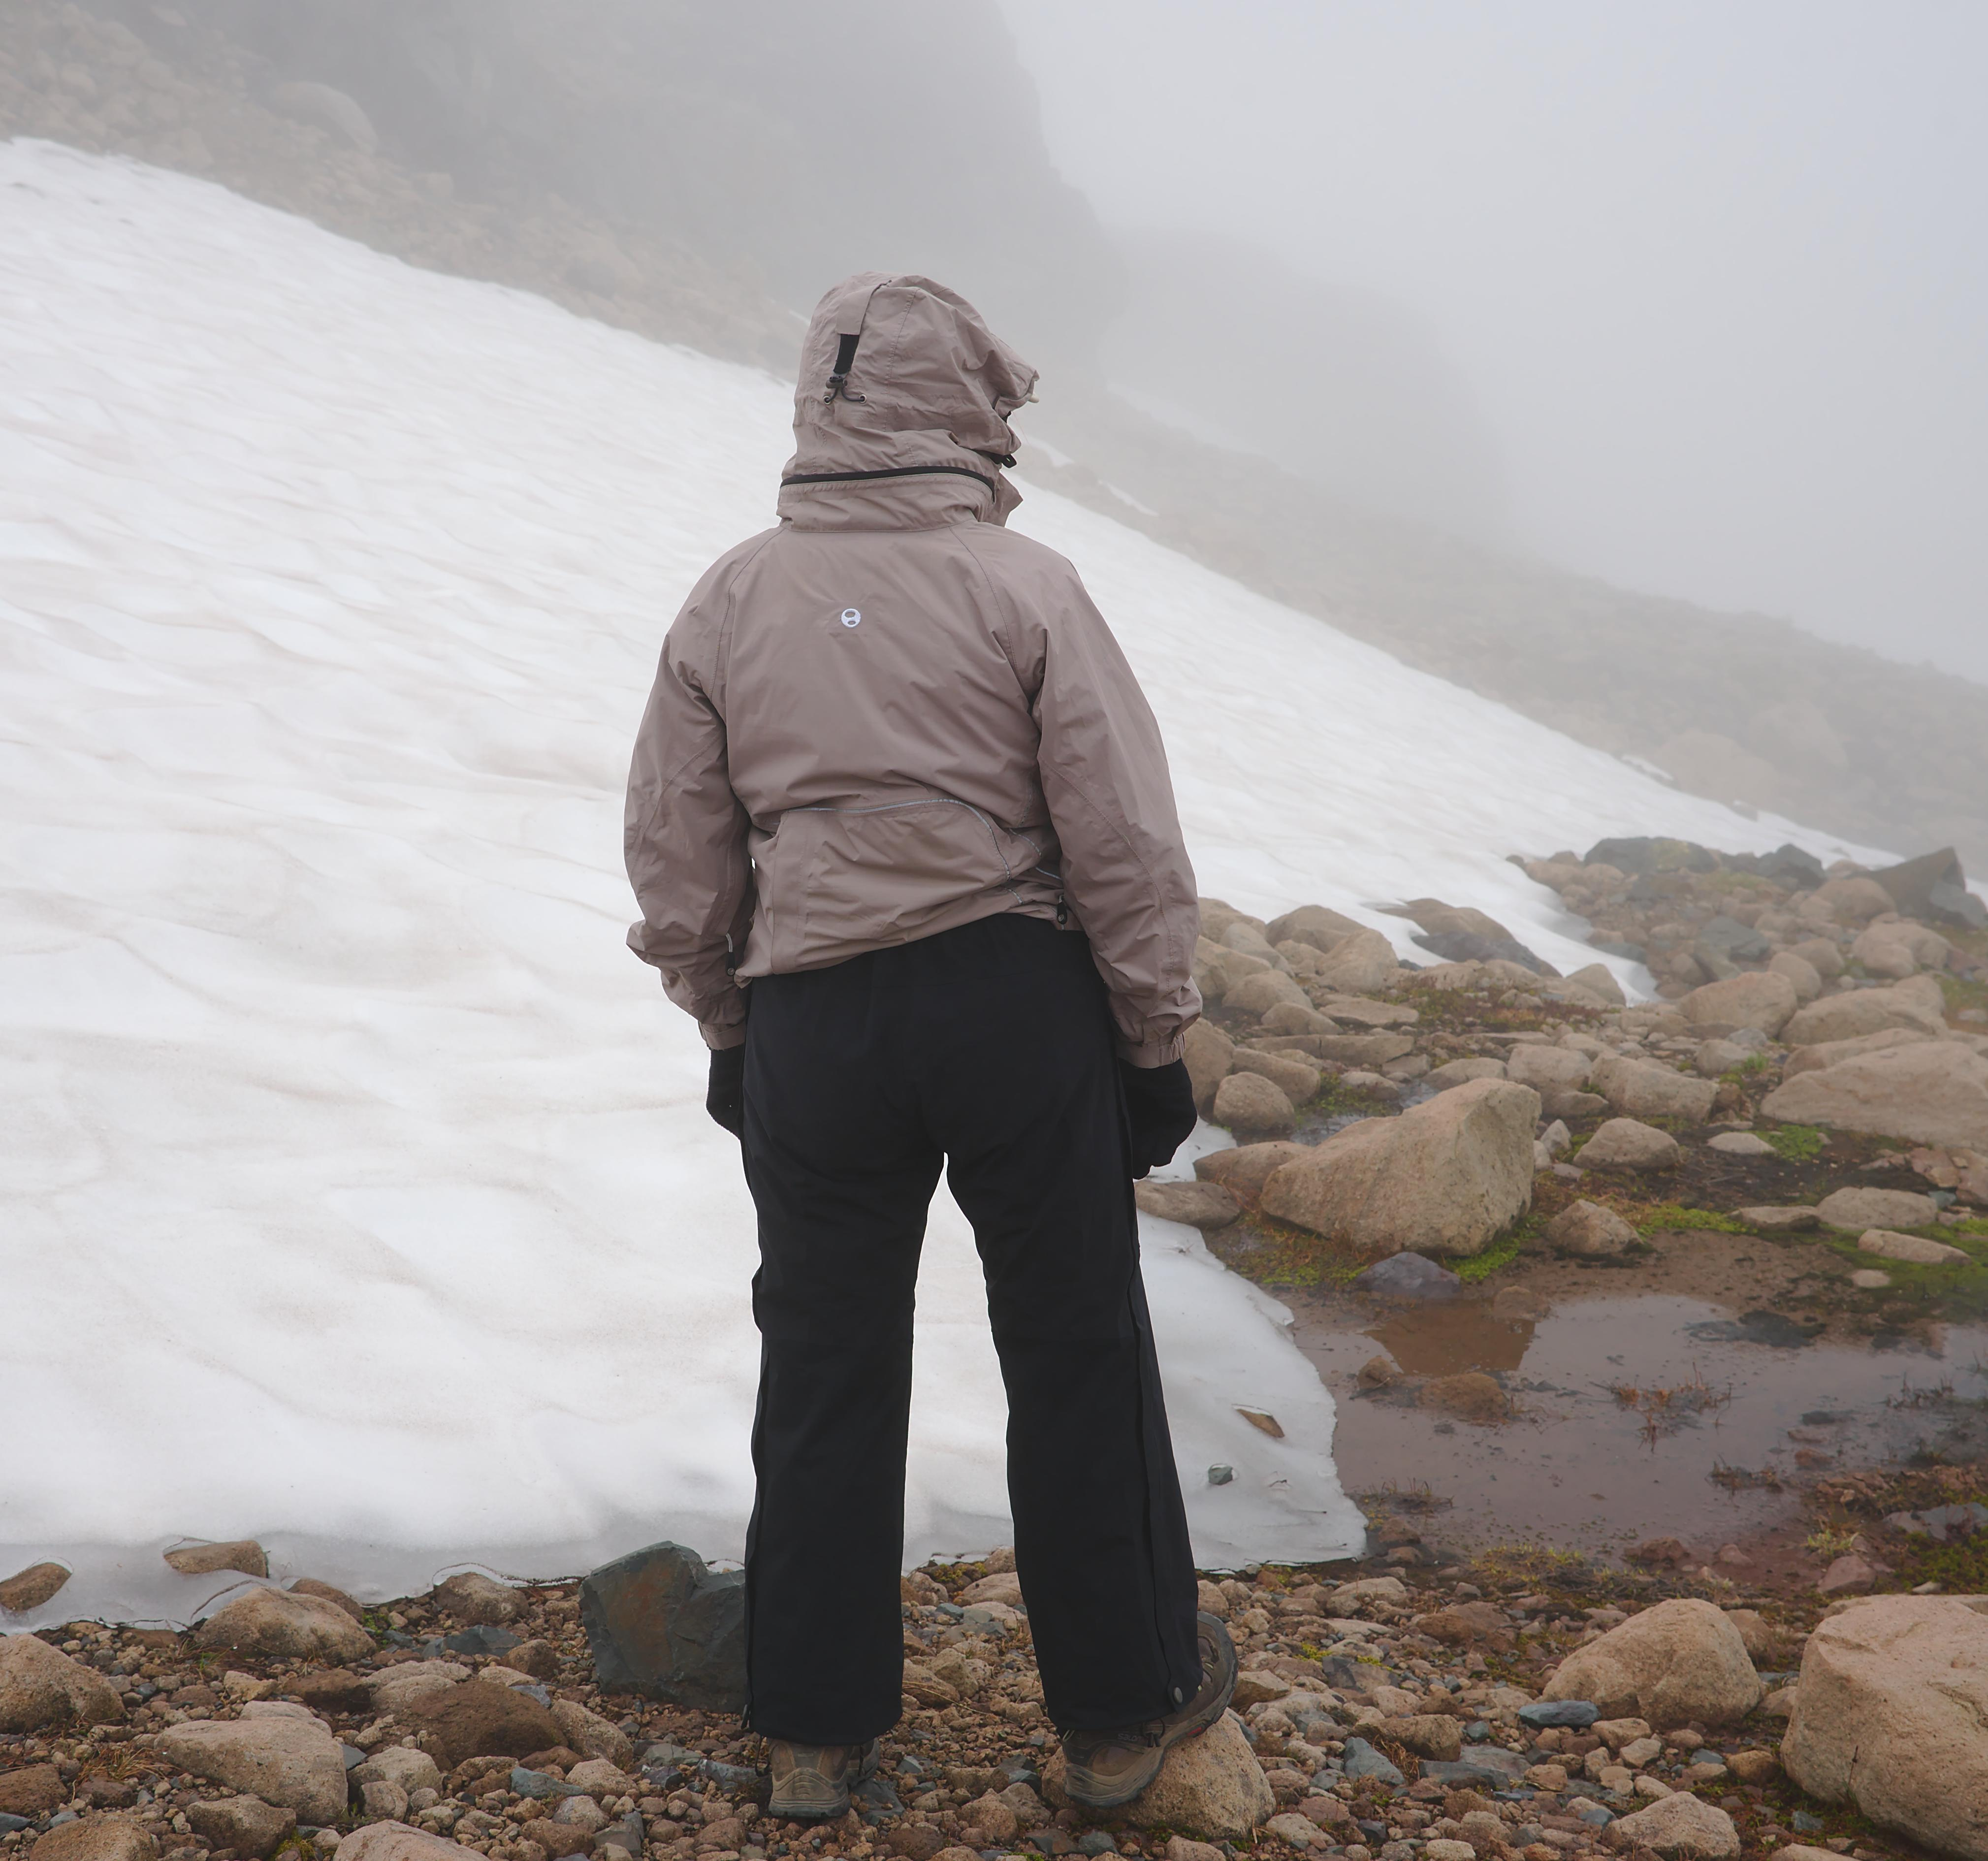 Female hiker wearing rain jacket and rain pants in fog on a mountain slope